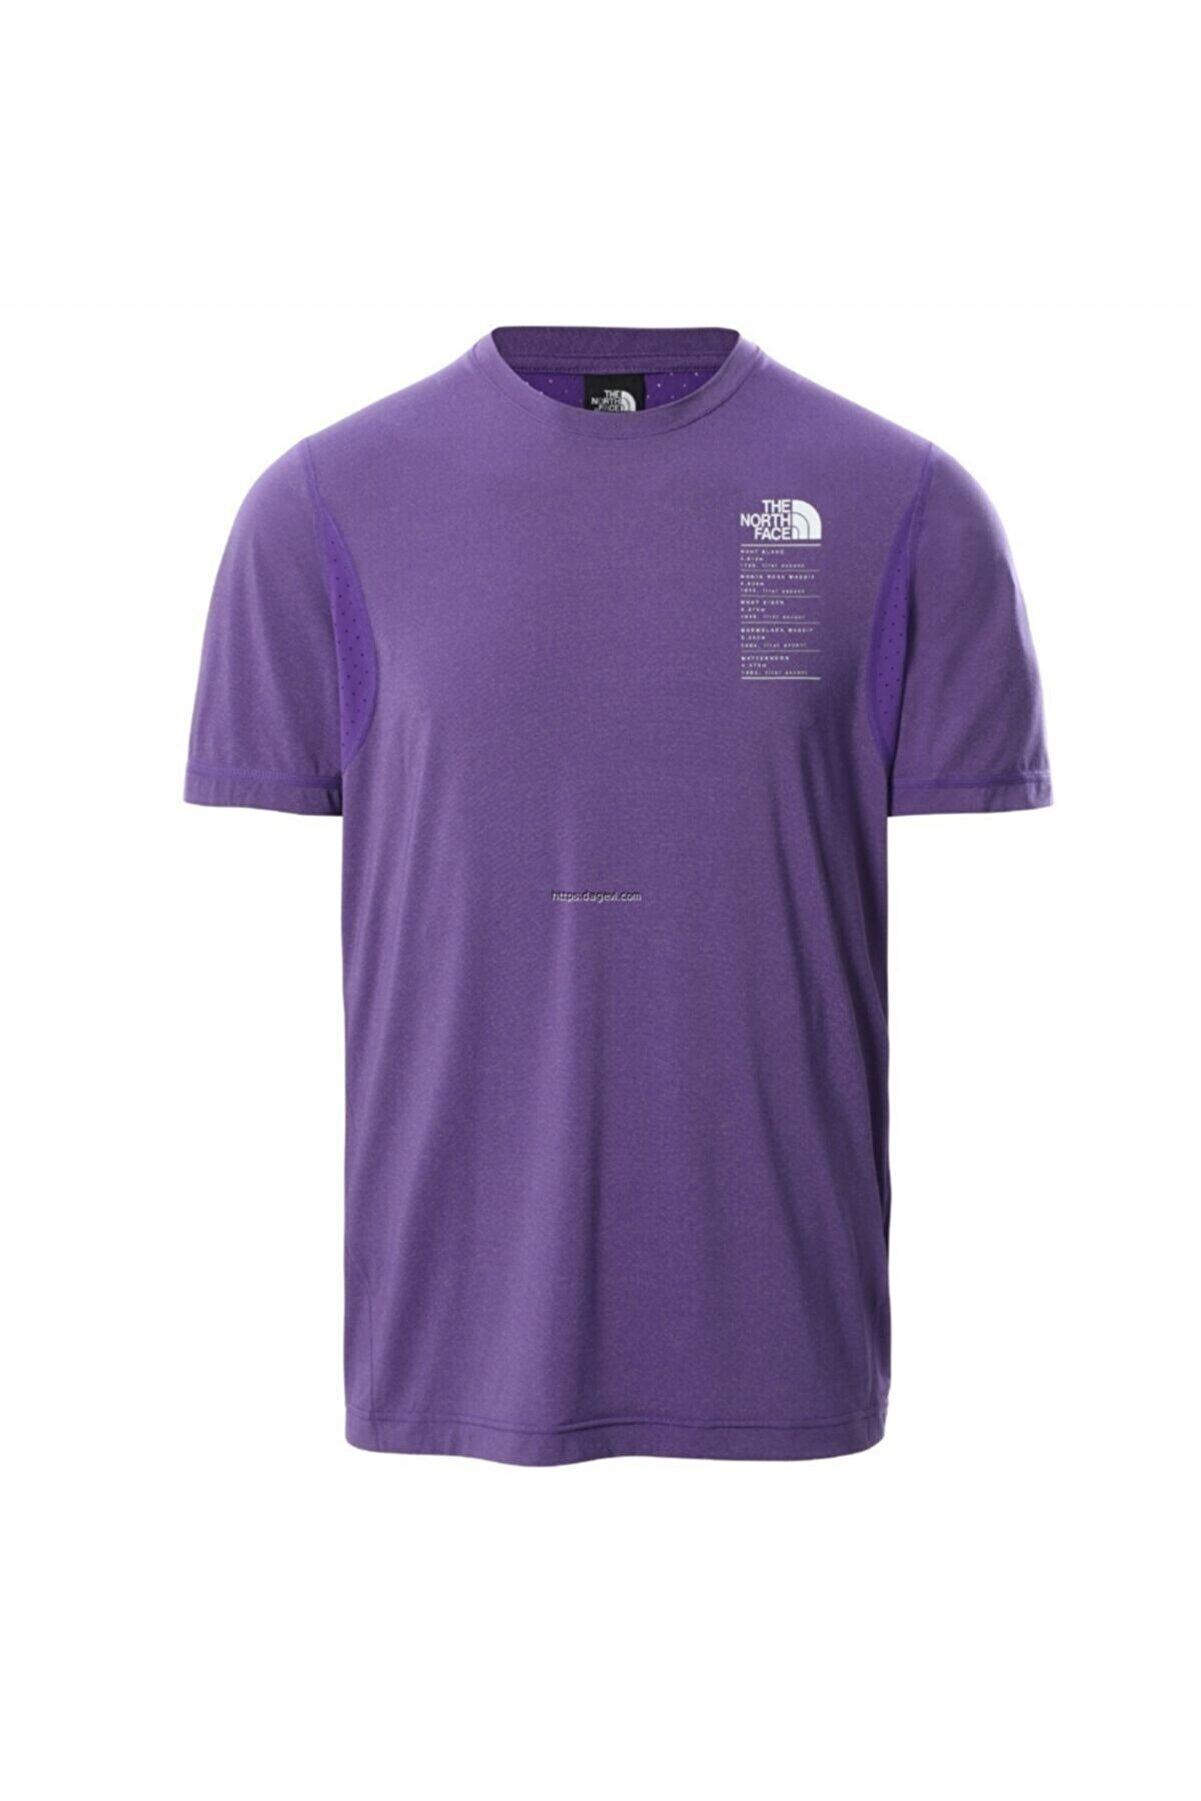 The North Face Glacier Erkek Mor T-shirt